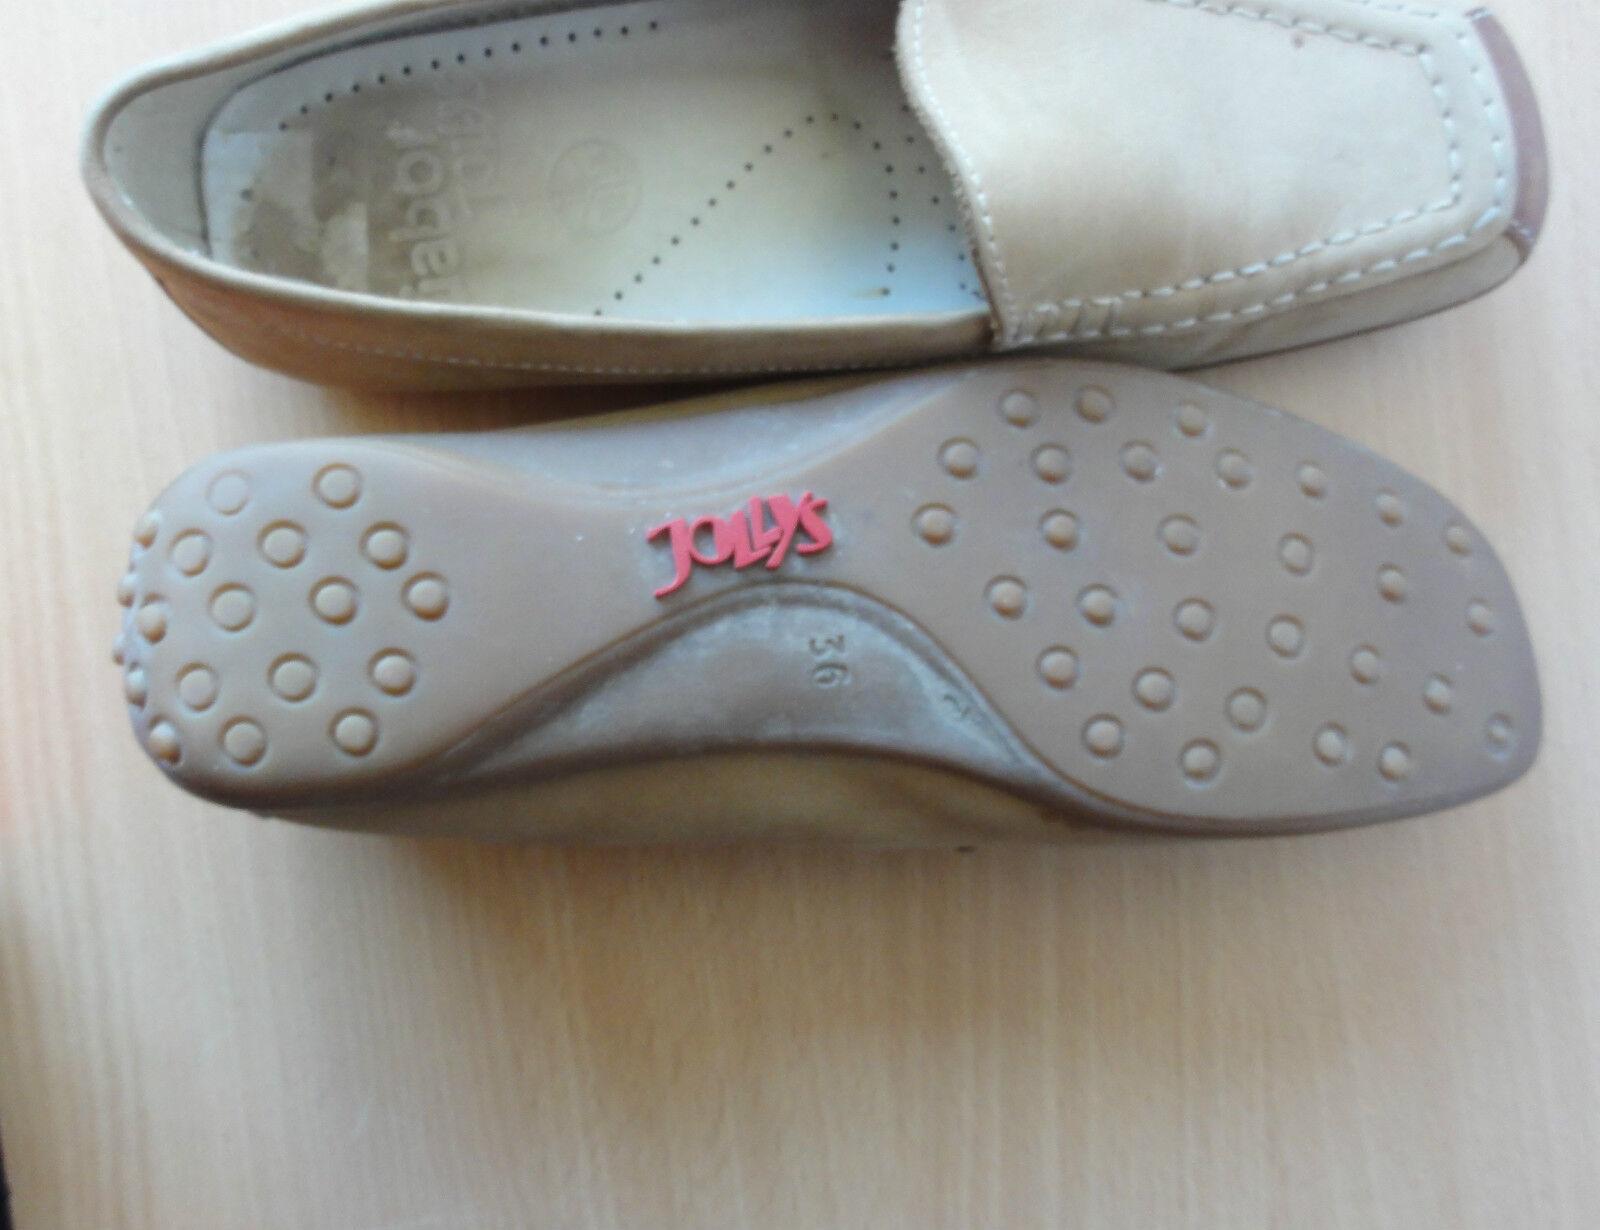 GABOR Jolly`s, Wildleder Schuhe, Ballerinas, Slipper in beige, Gr. 36